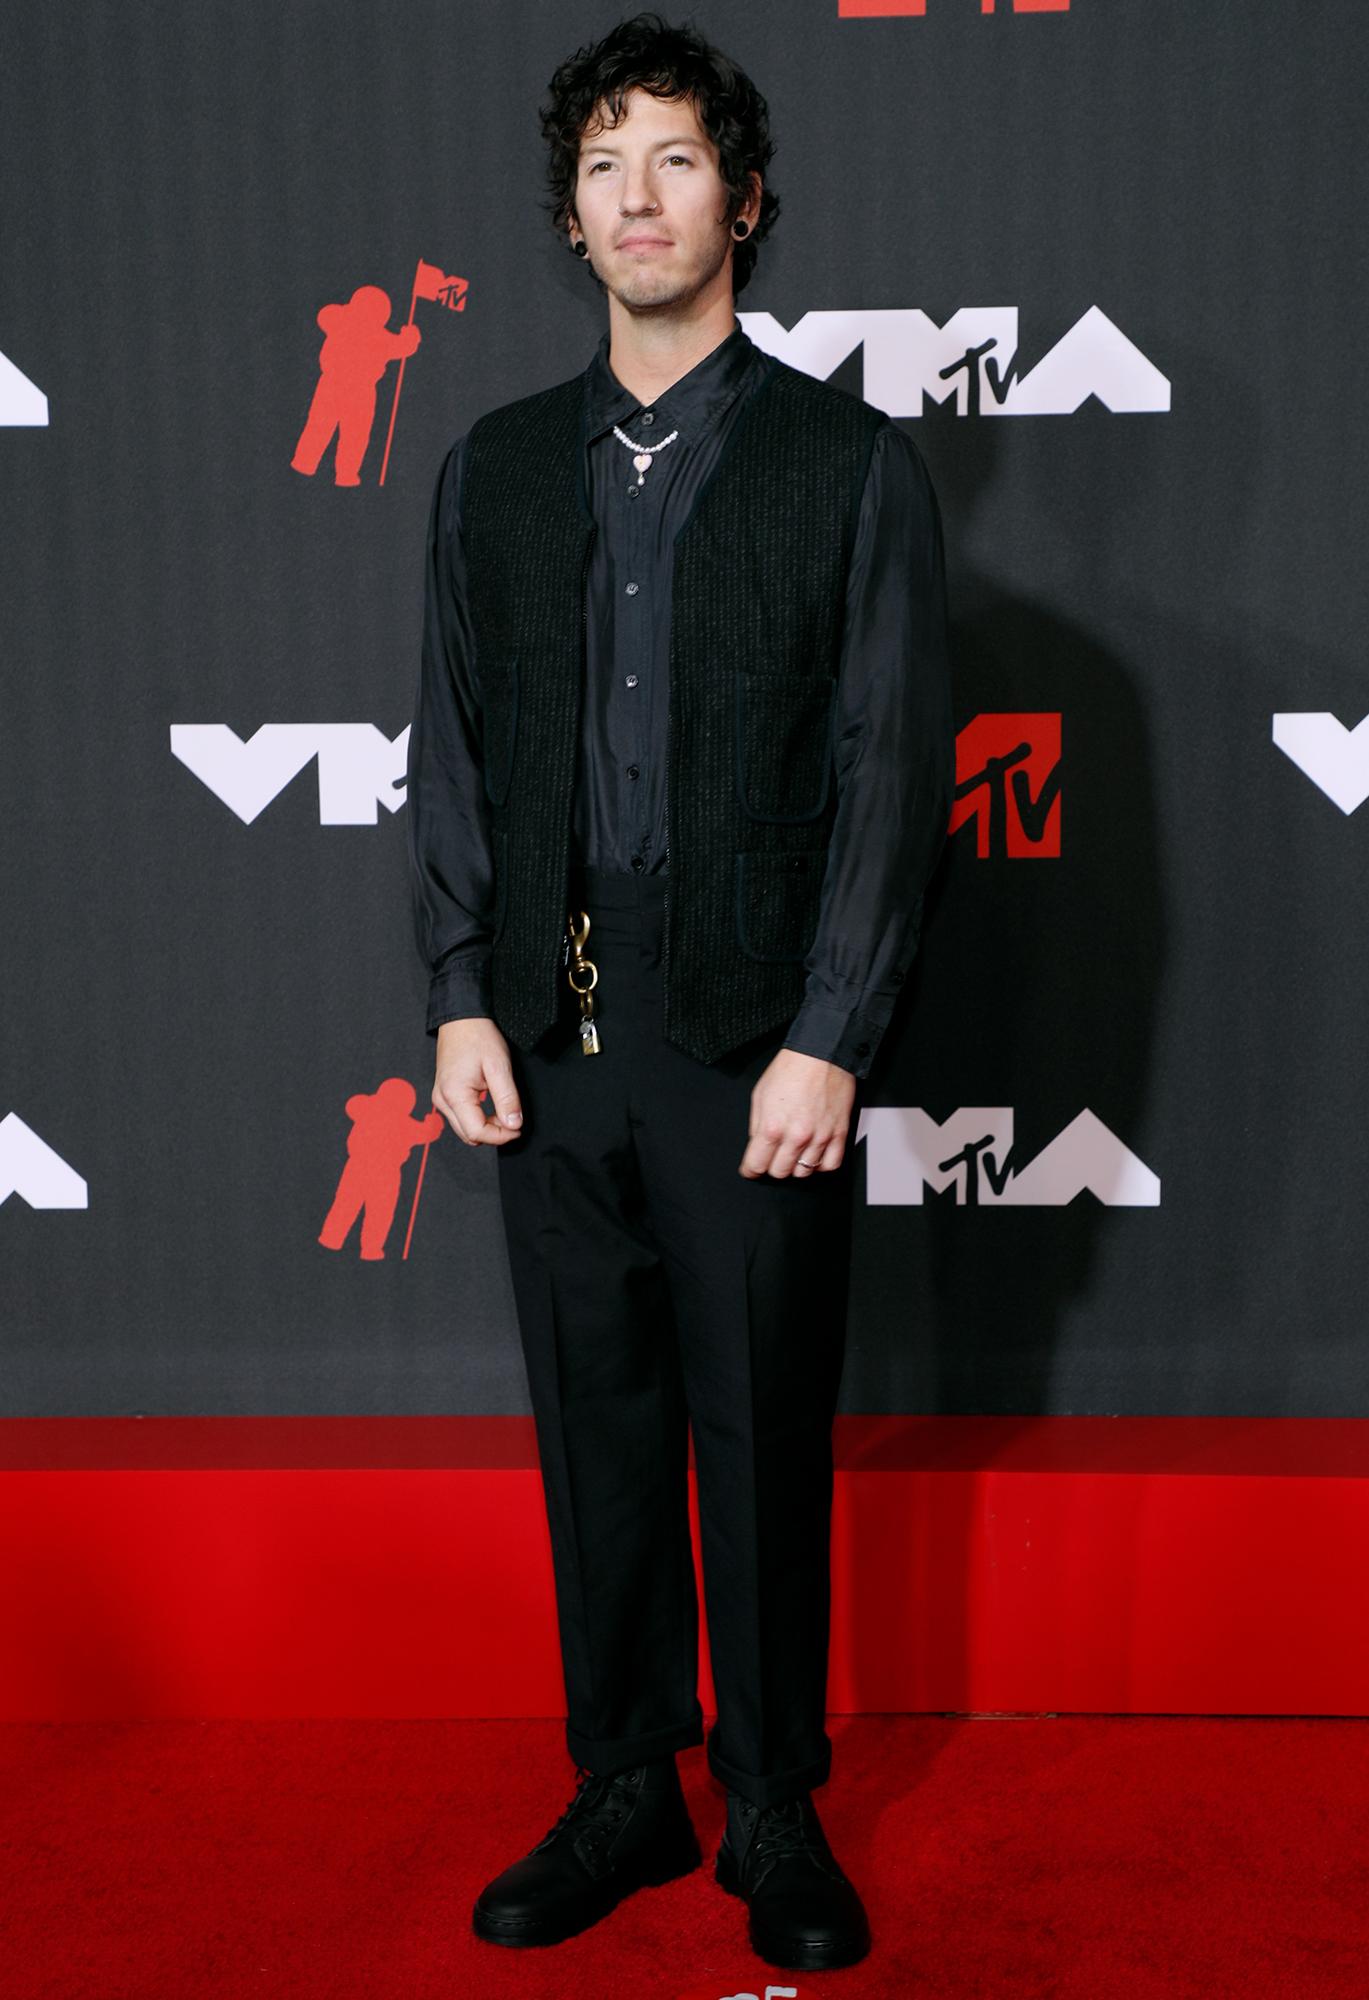 Josh Dun arrives at the 2021 MTV Video Music Awards